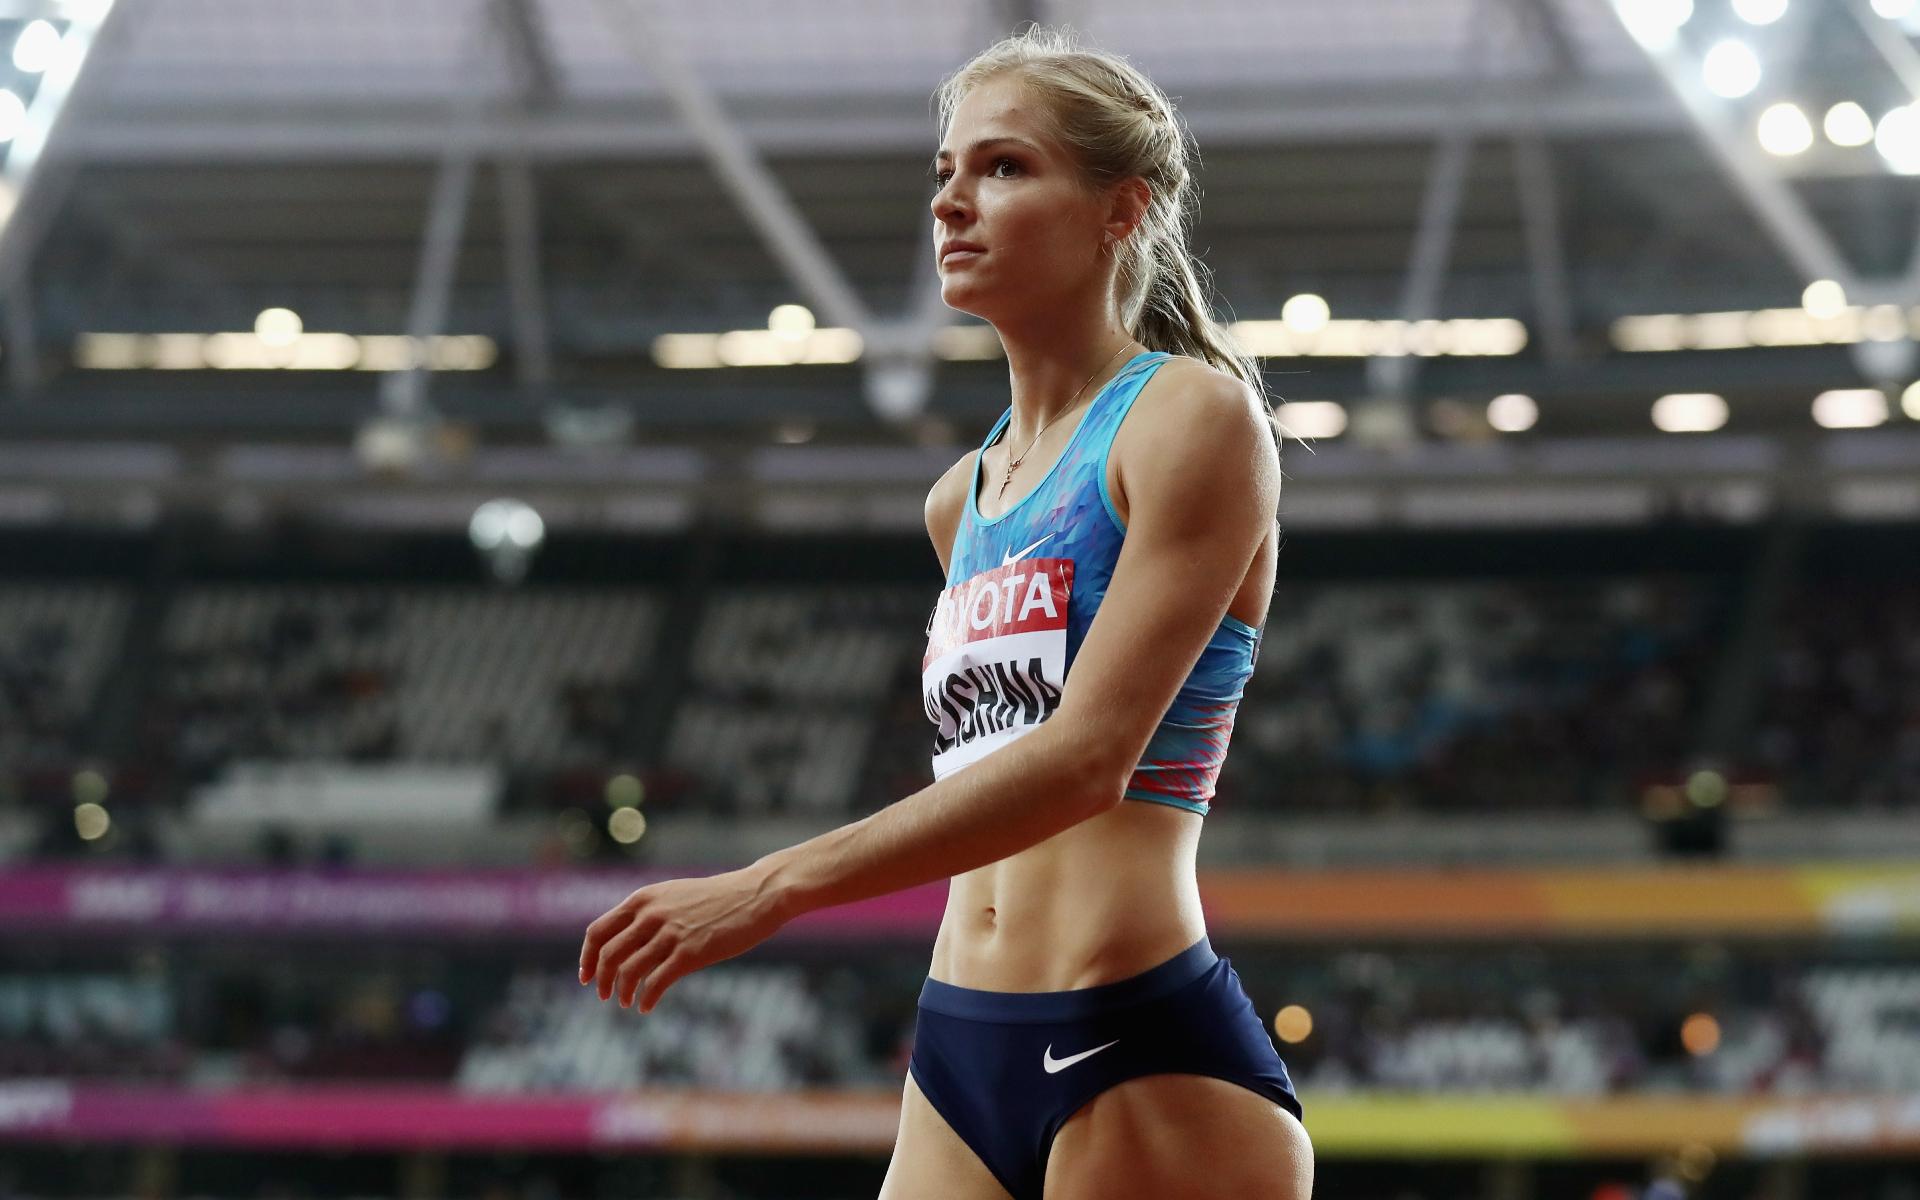 Фото: Дарья Клишина ( Alexander Hassenstein/Getty Images - for IAAF)